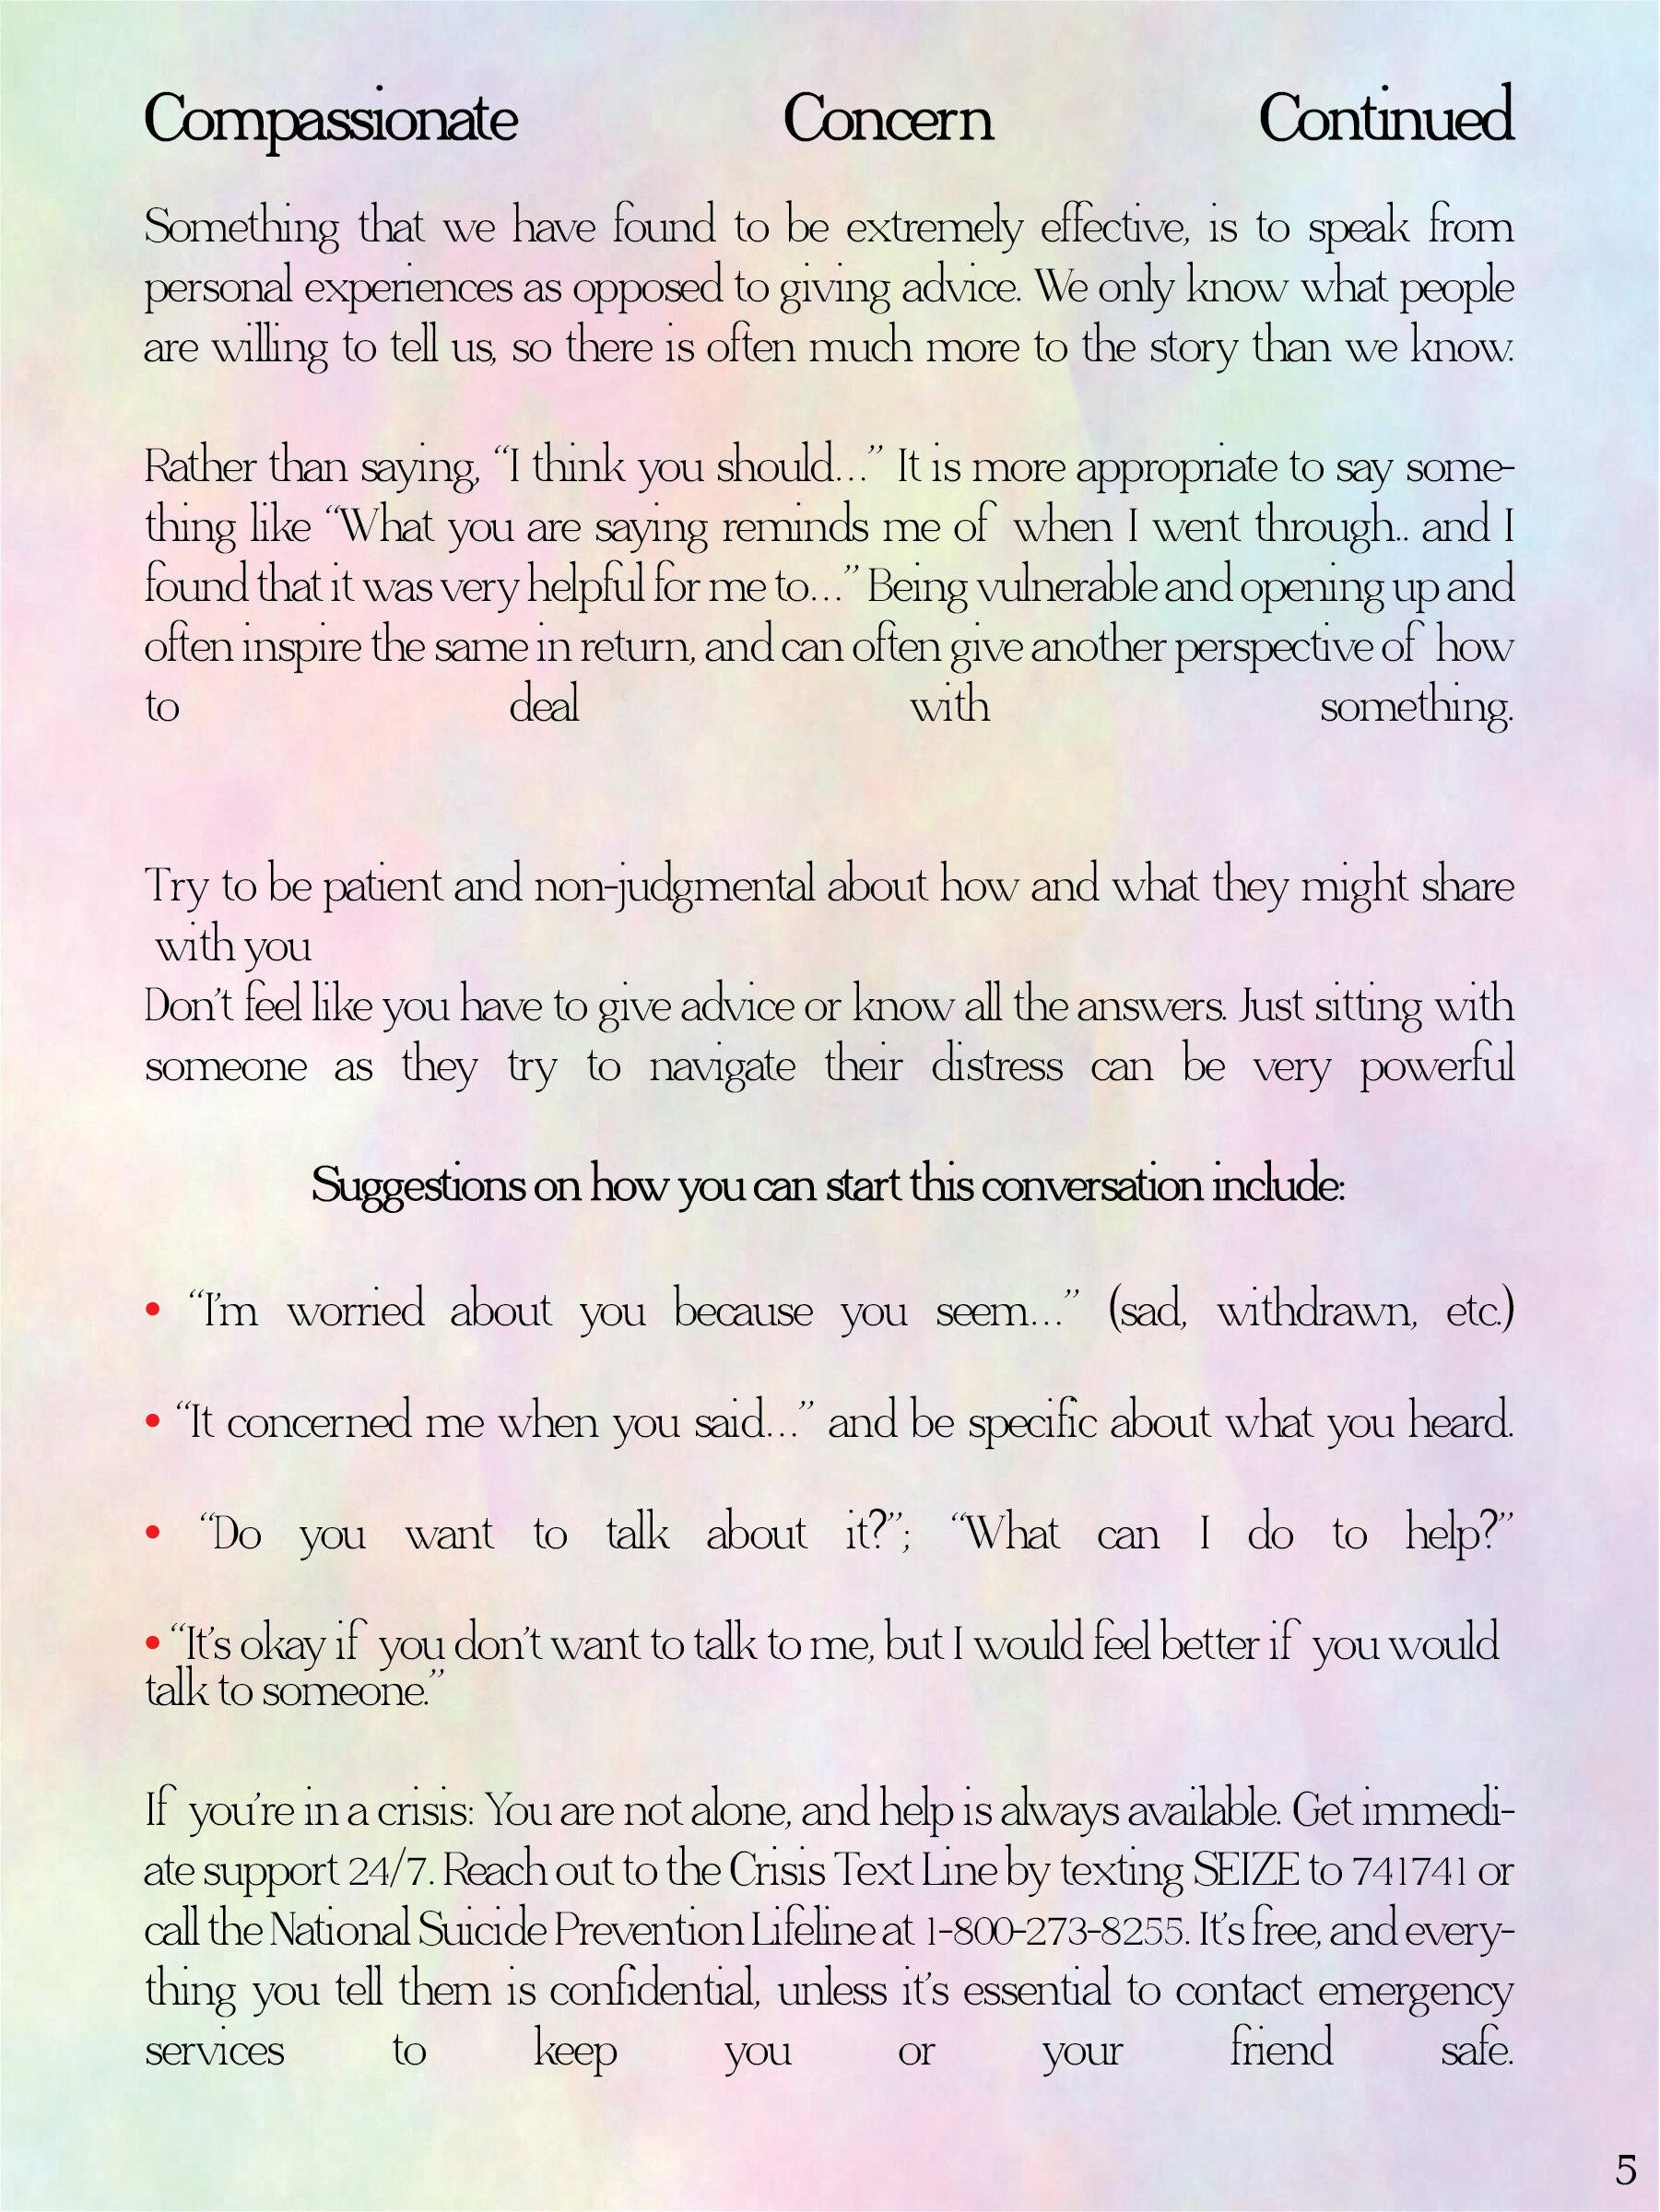 World Mental Health Day Pamphlet-05.jpeg